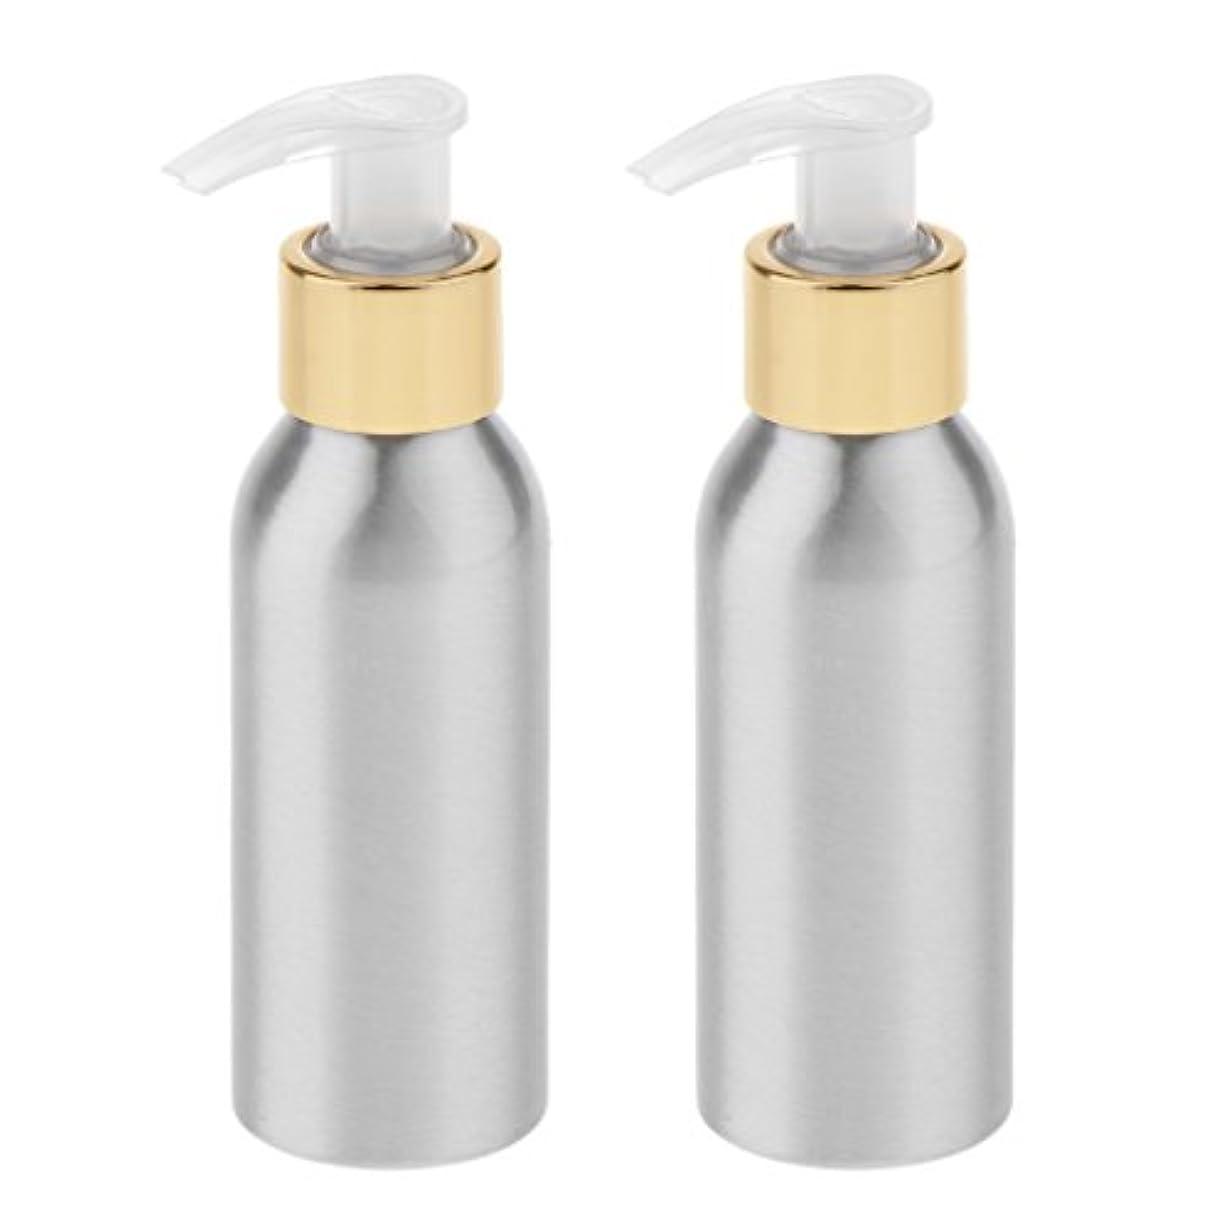 Blesiya 2本 スプレーボトル ポンプボトル アルミボトル 噴霧器 香水ボトル 通勤/旅行/出張 便利 6サイズ選択 - 120ml